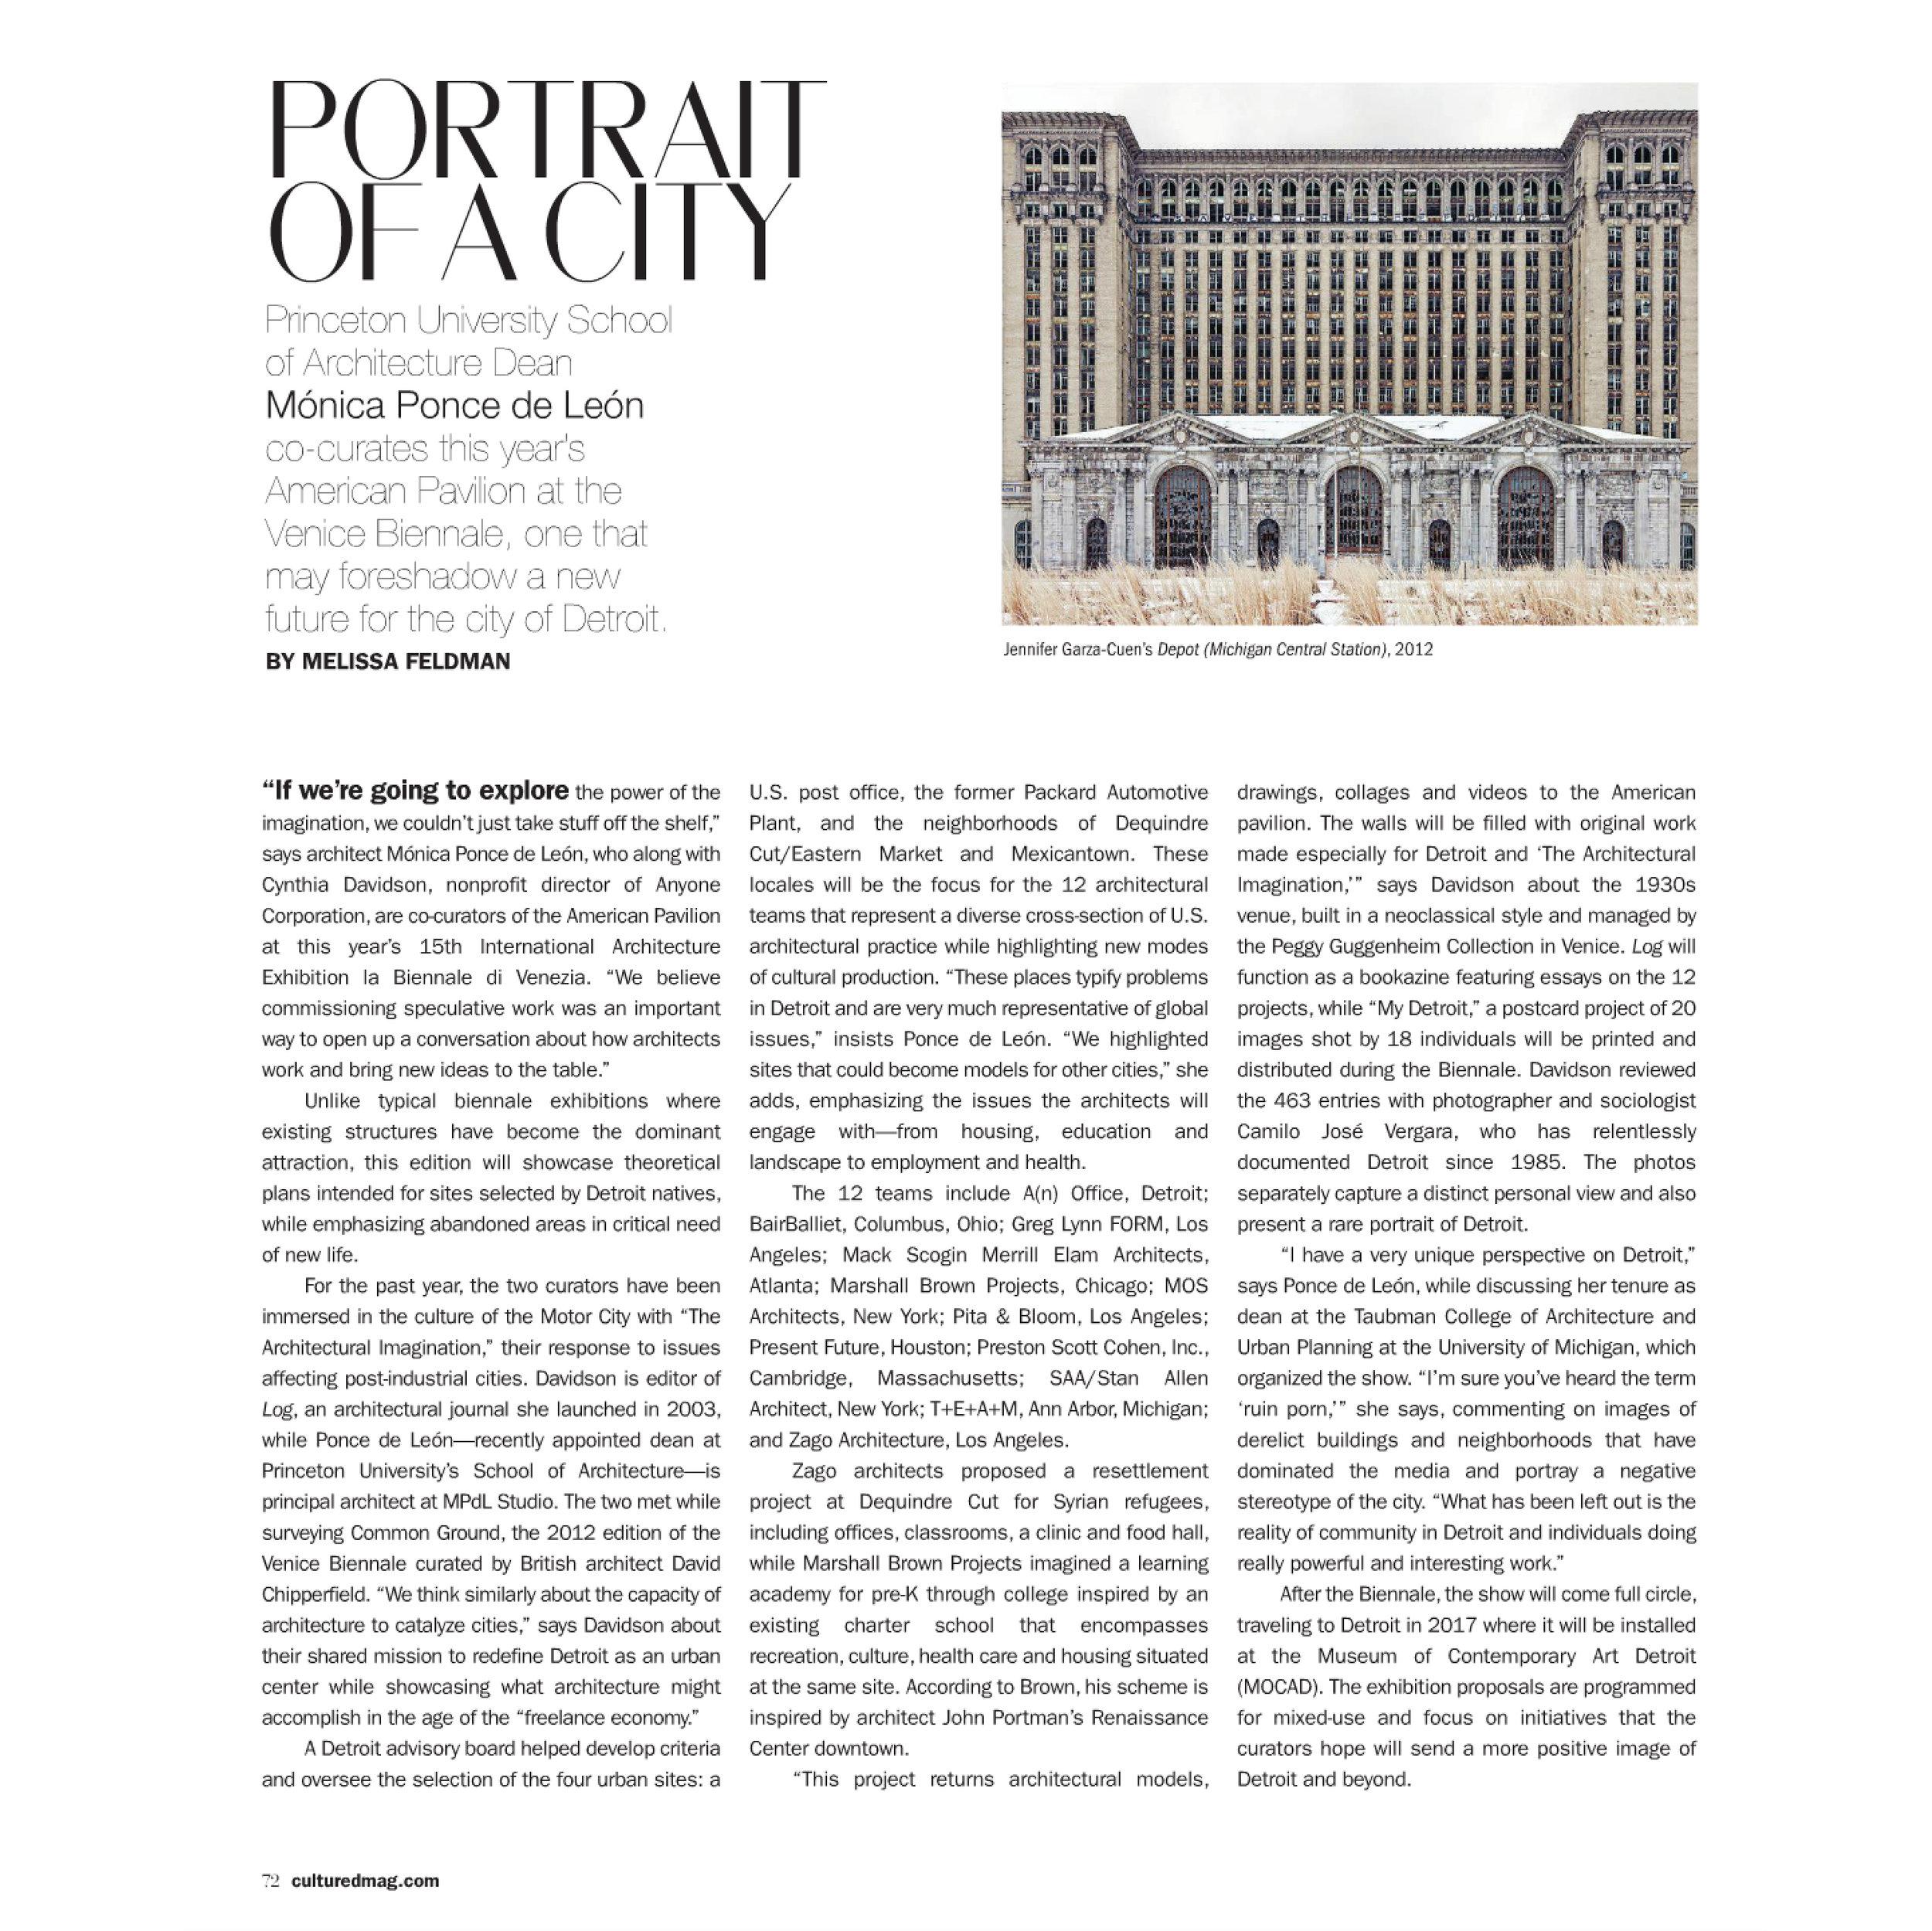 cultured-magazine1.jpg